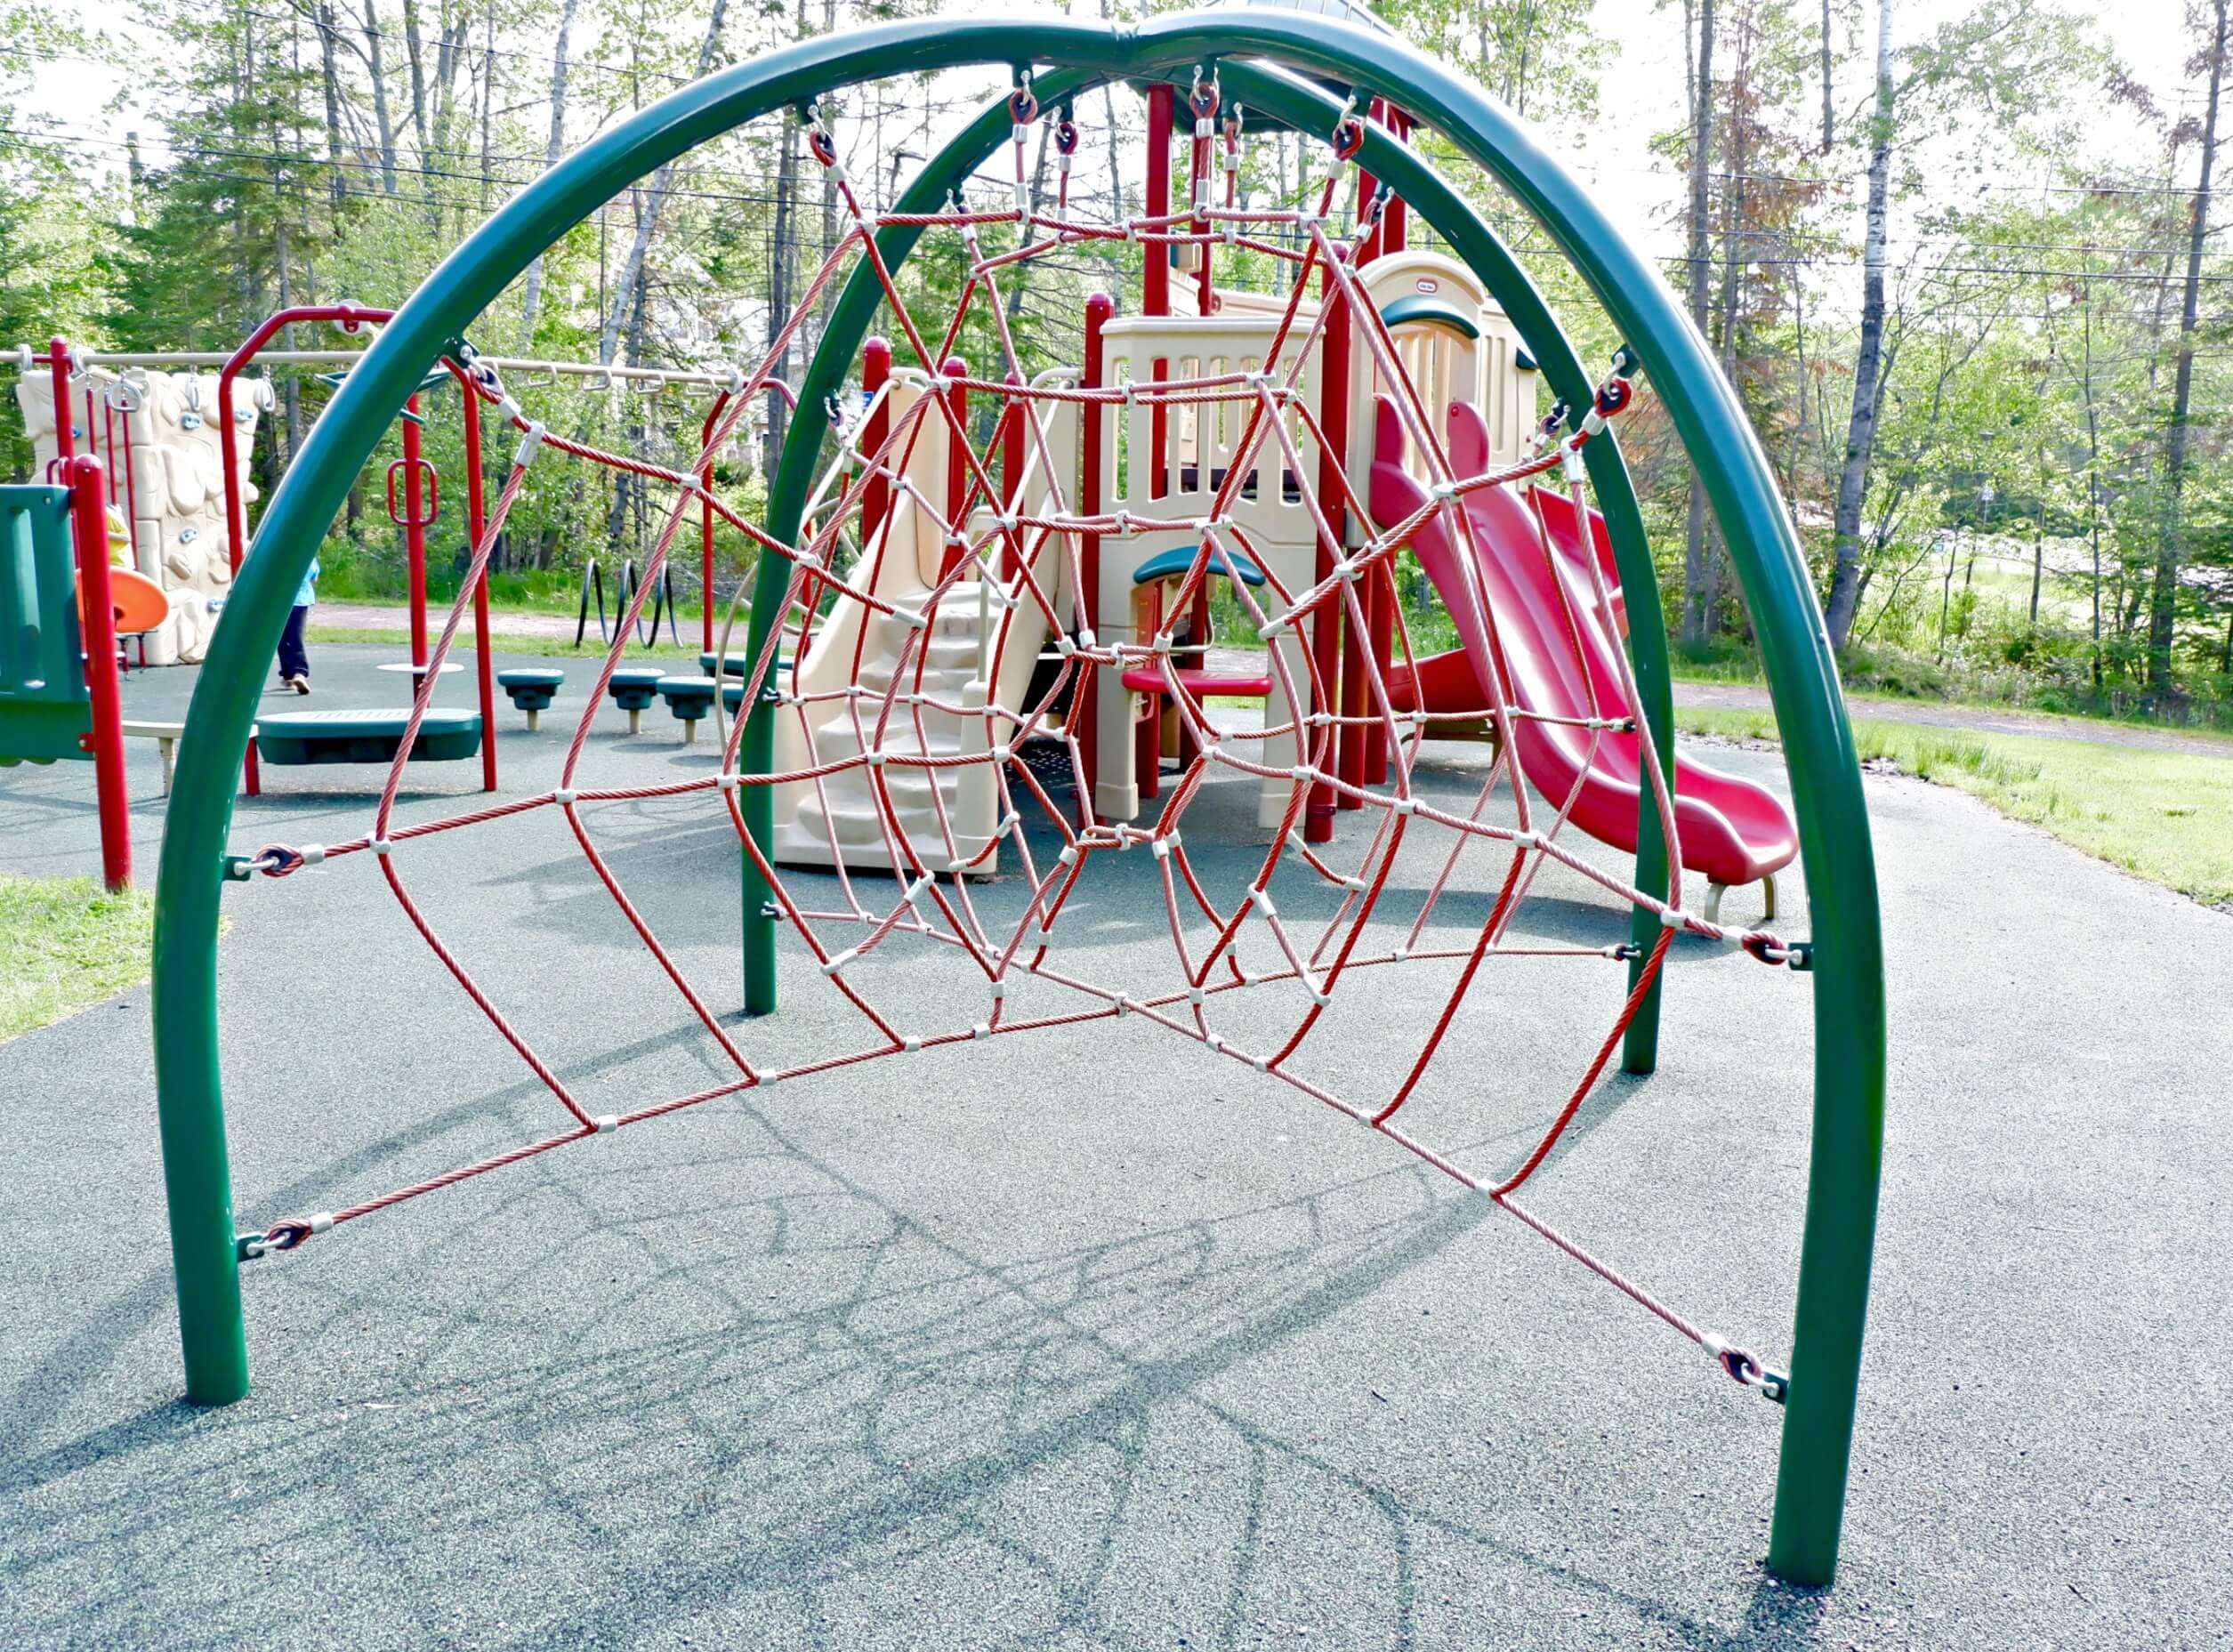 CAMLLE PARK moncton riverview dieppe best playground park pickle planet